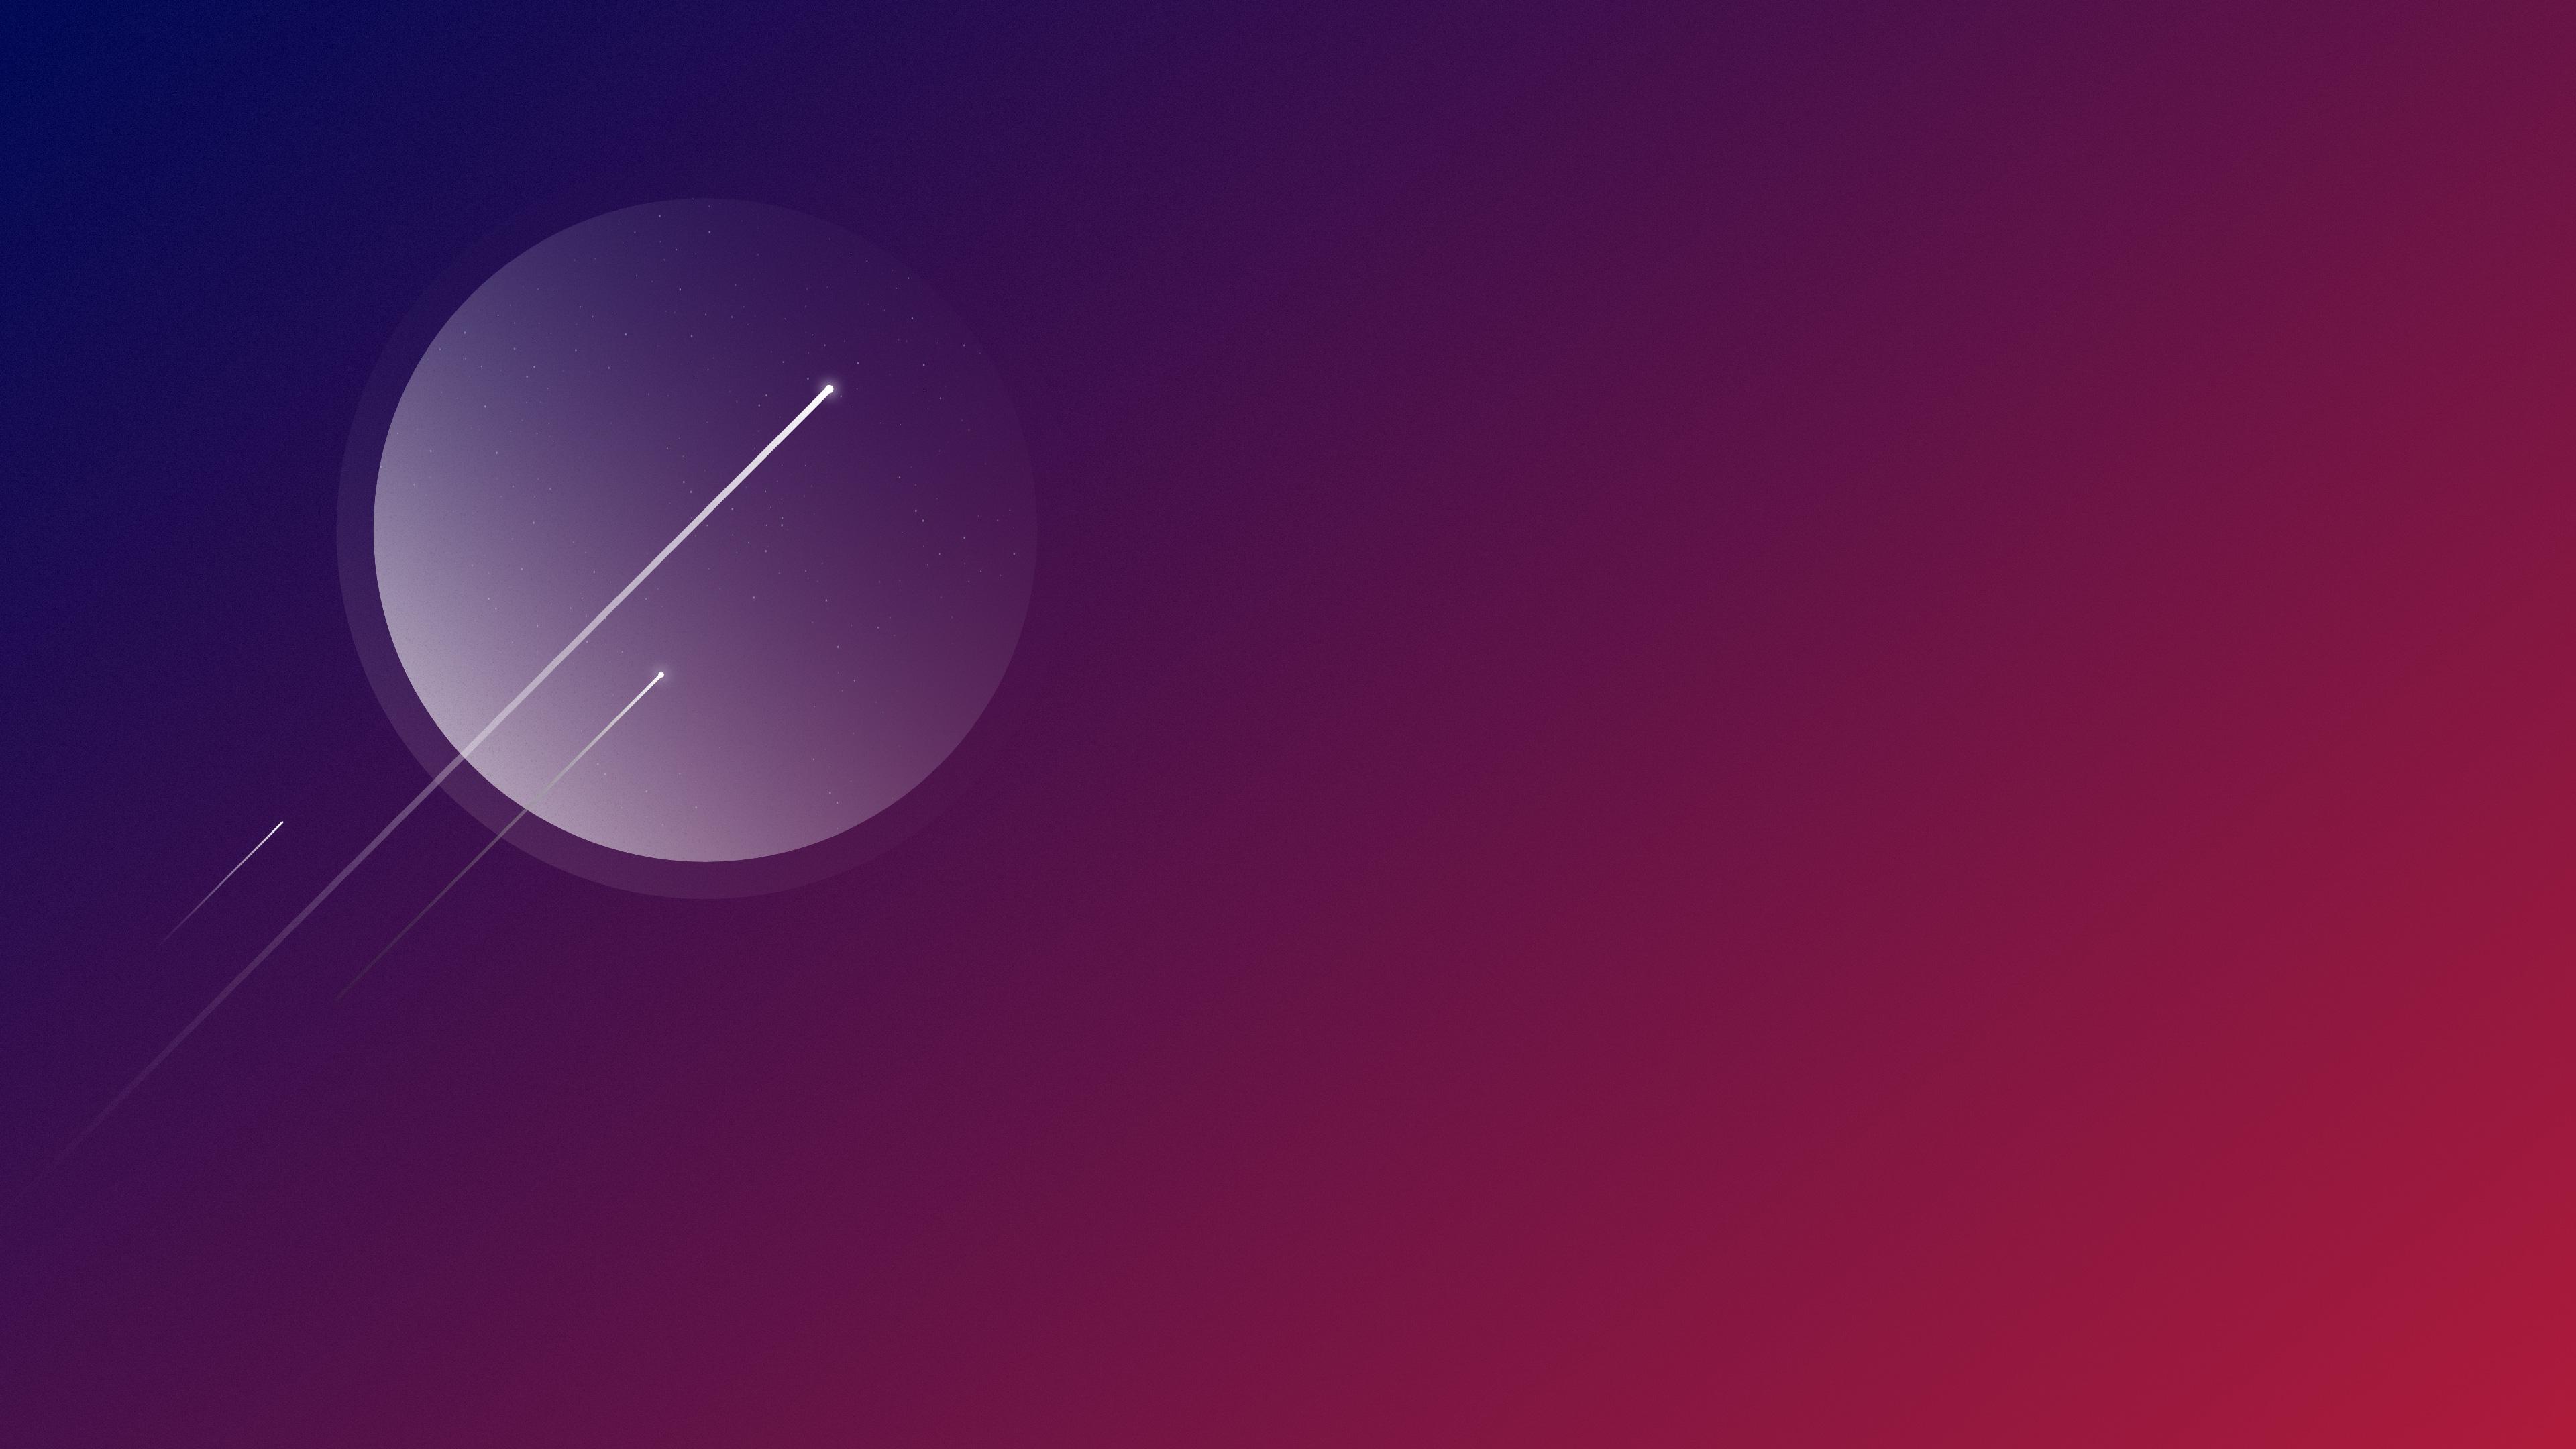 Minimalism Shooting Stars 4k Hd Artist 4k Wallpapers